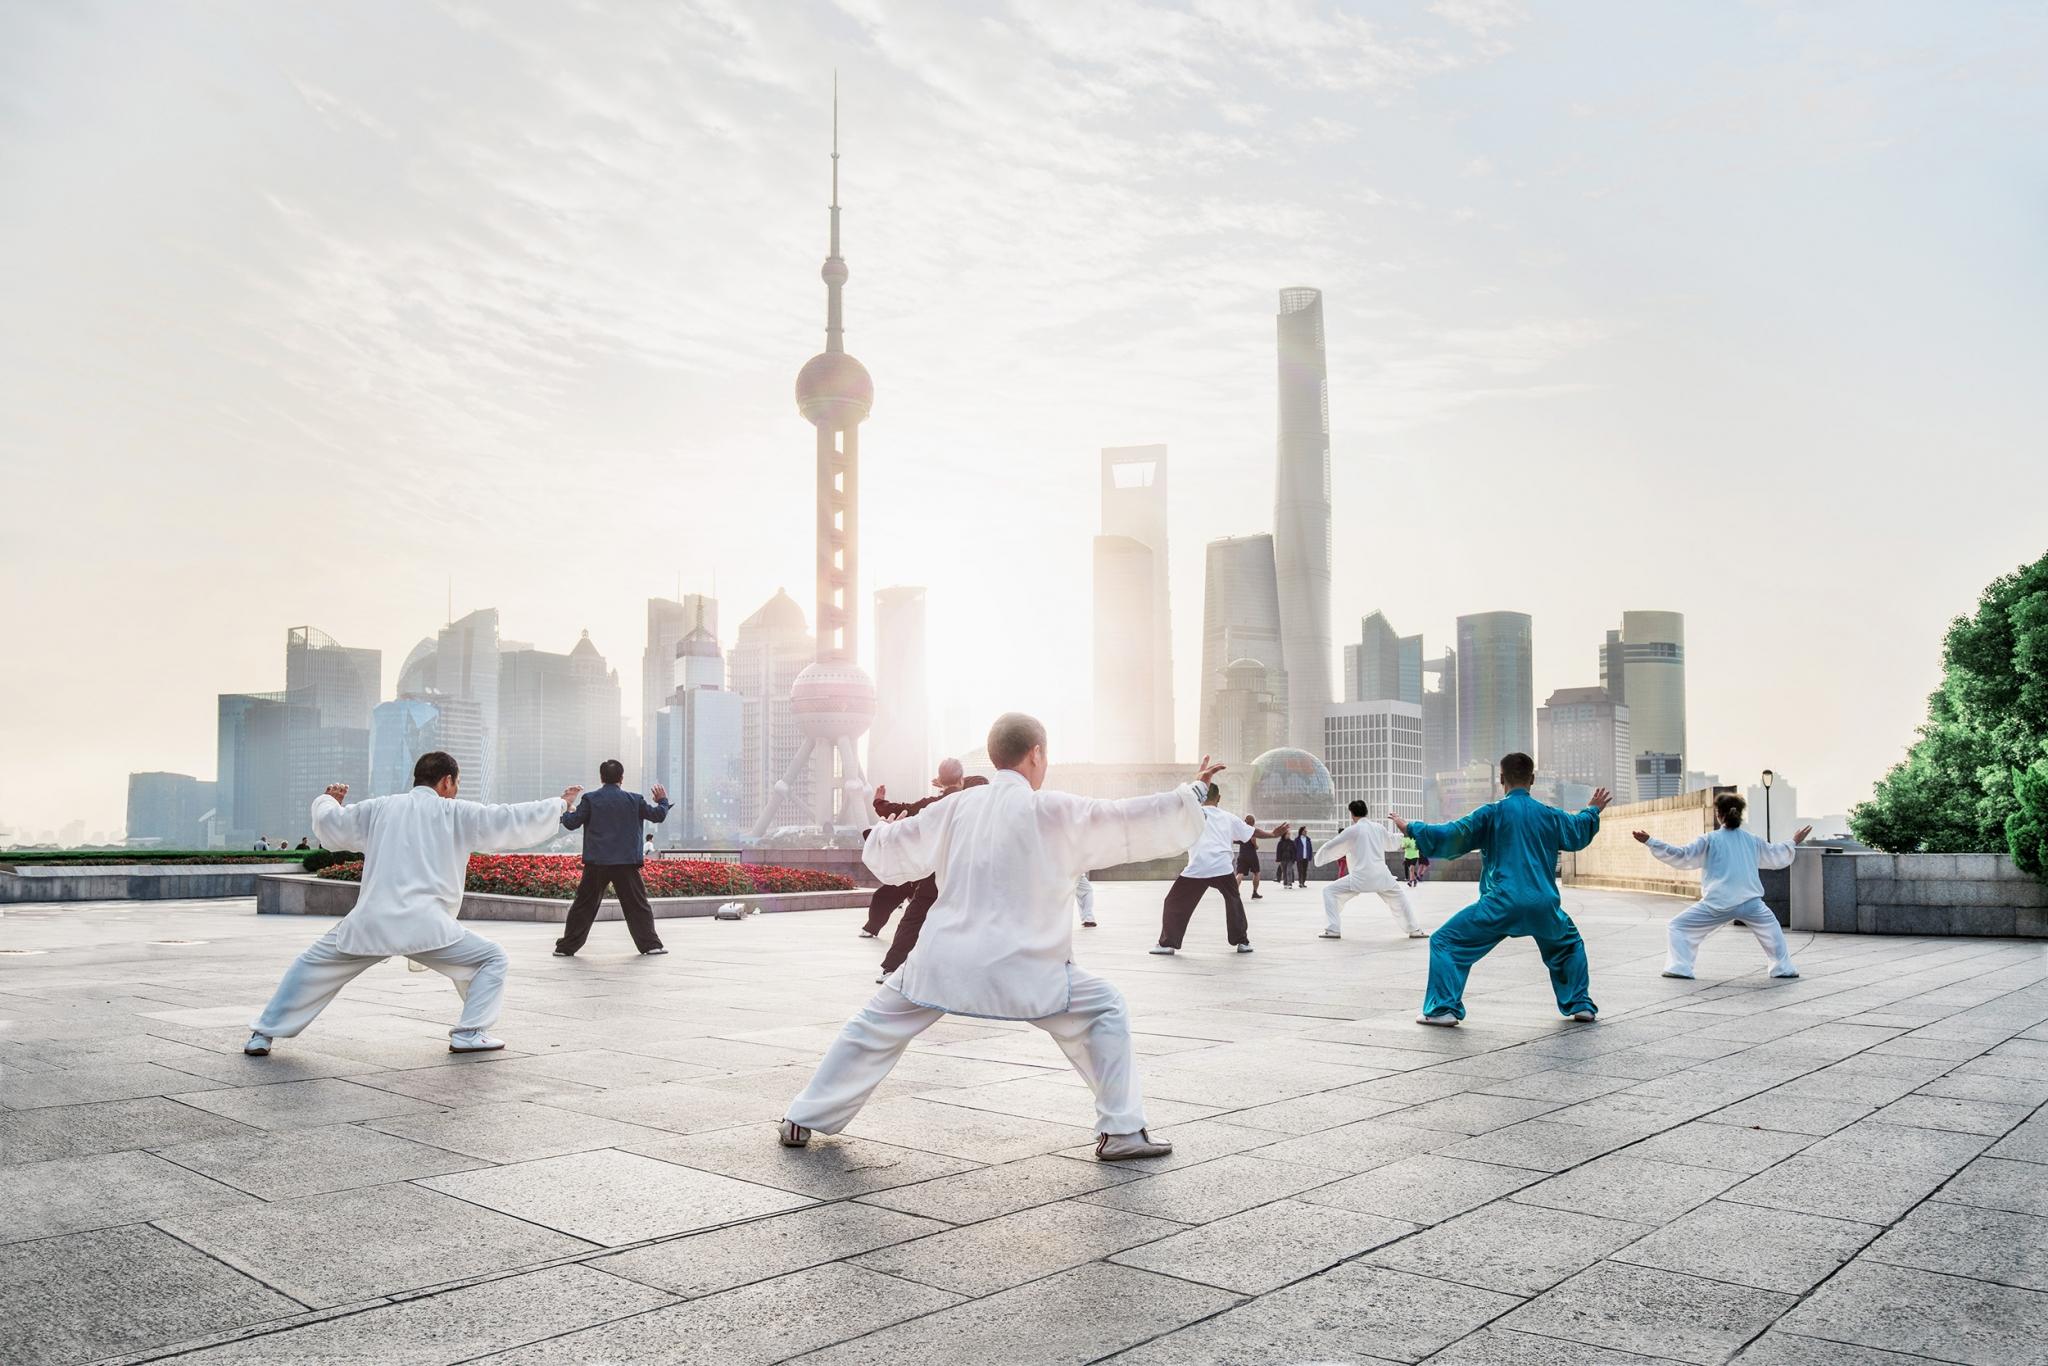 Interkulturelle Keynote China